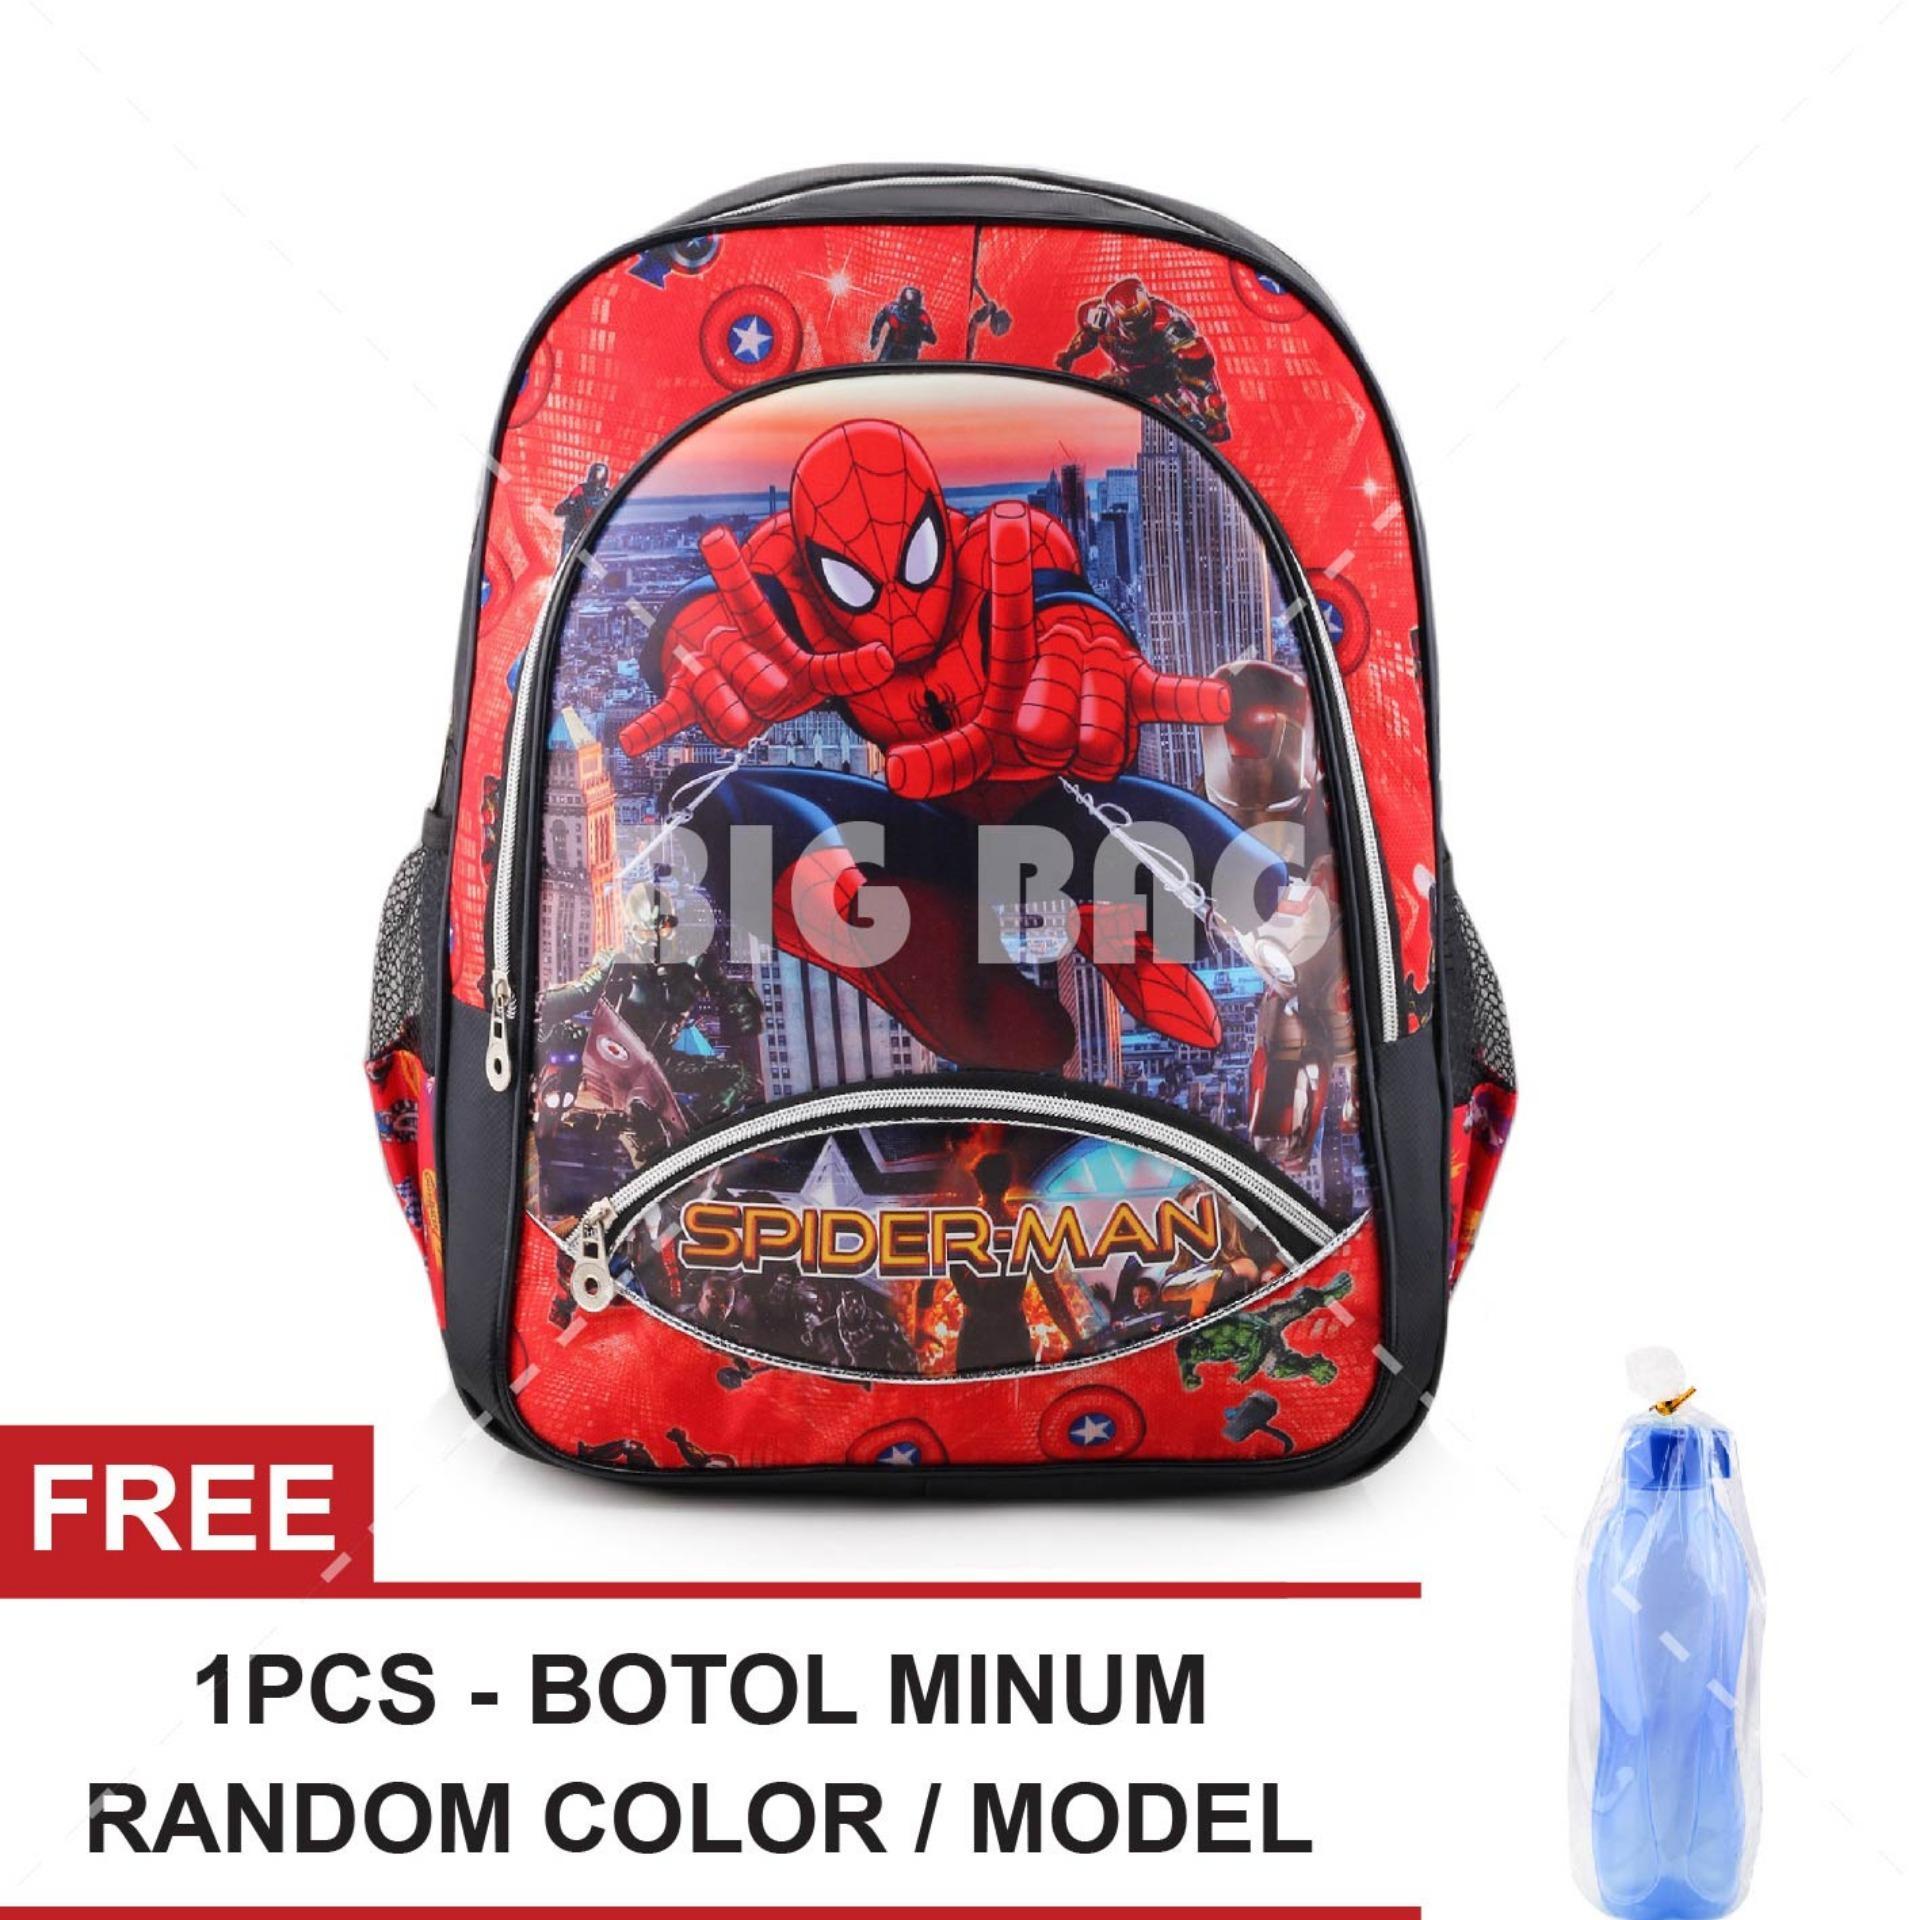 Harga Tas Ransel Anak Spider Man Flying High Sch**l Bag Tas Sekolah Anak Red Free Botol Minum Random Color Model Baru Murah